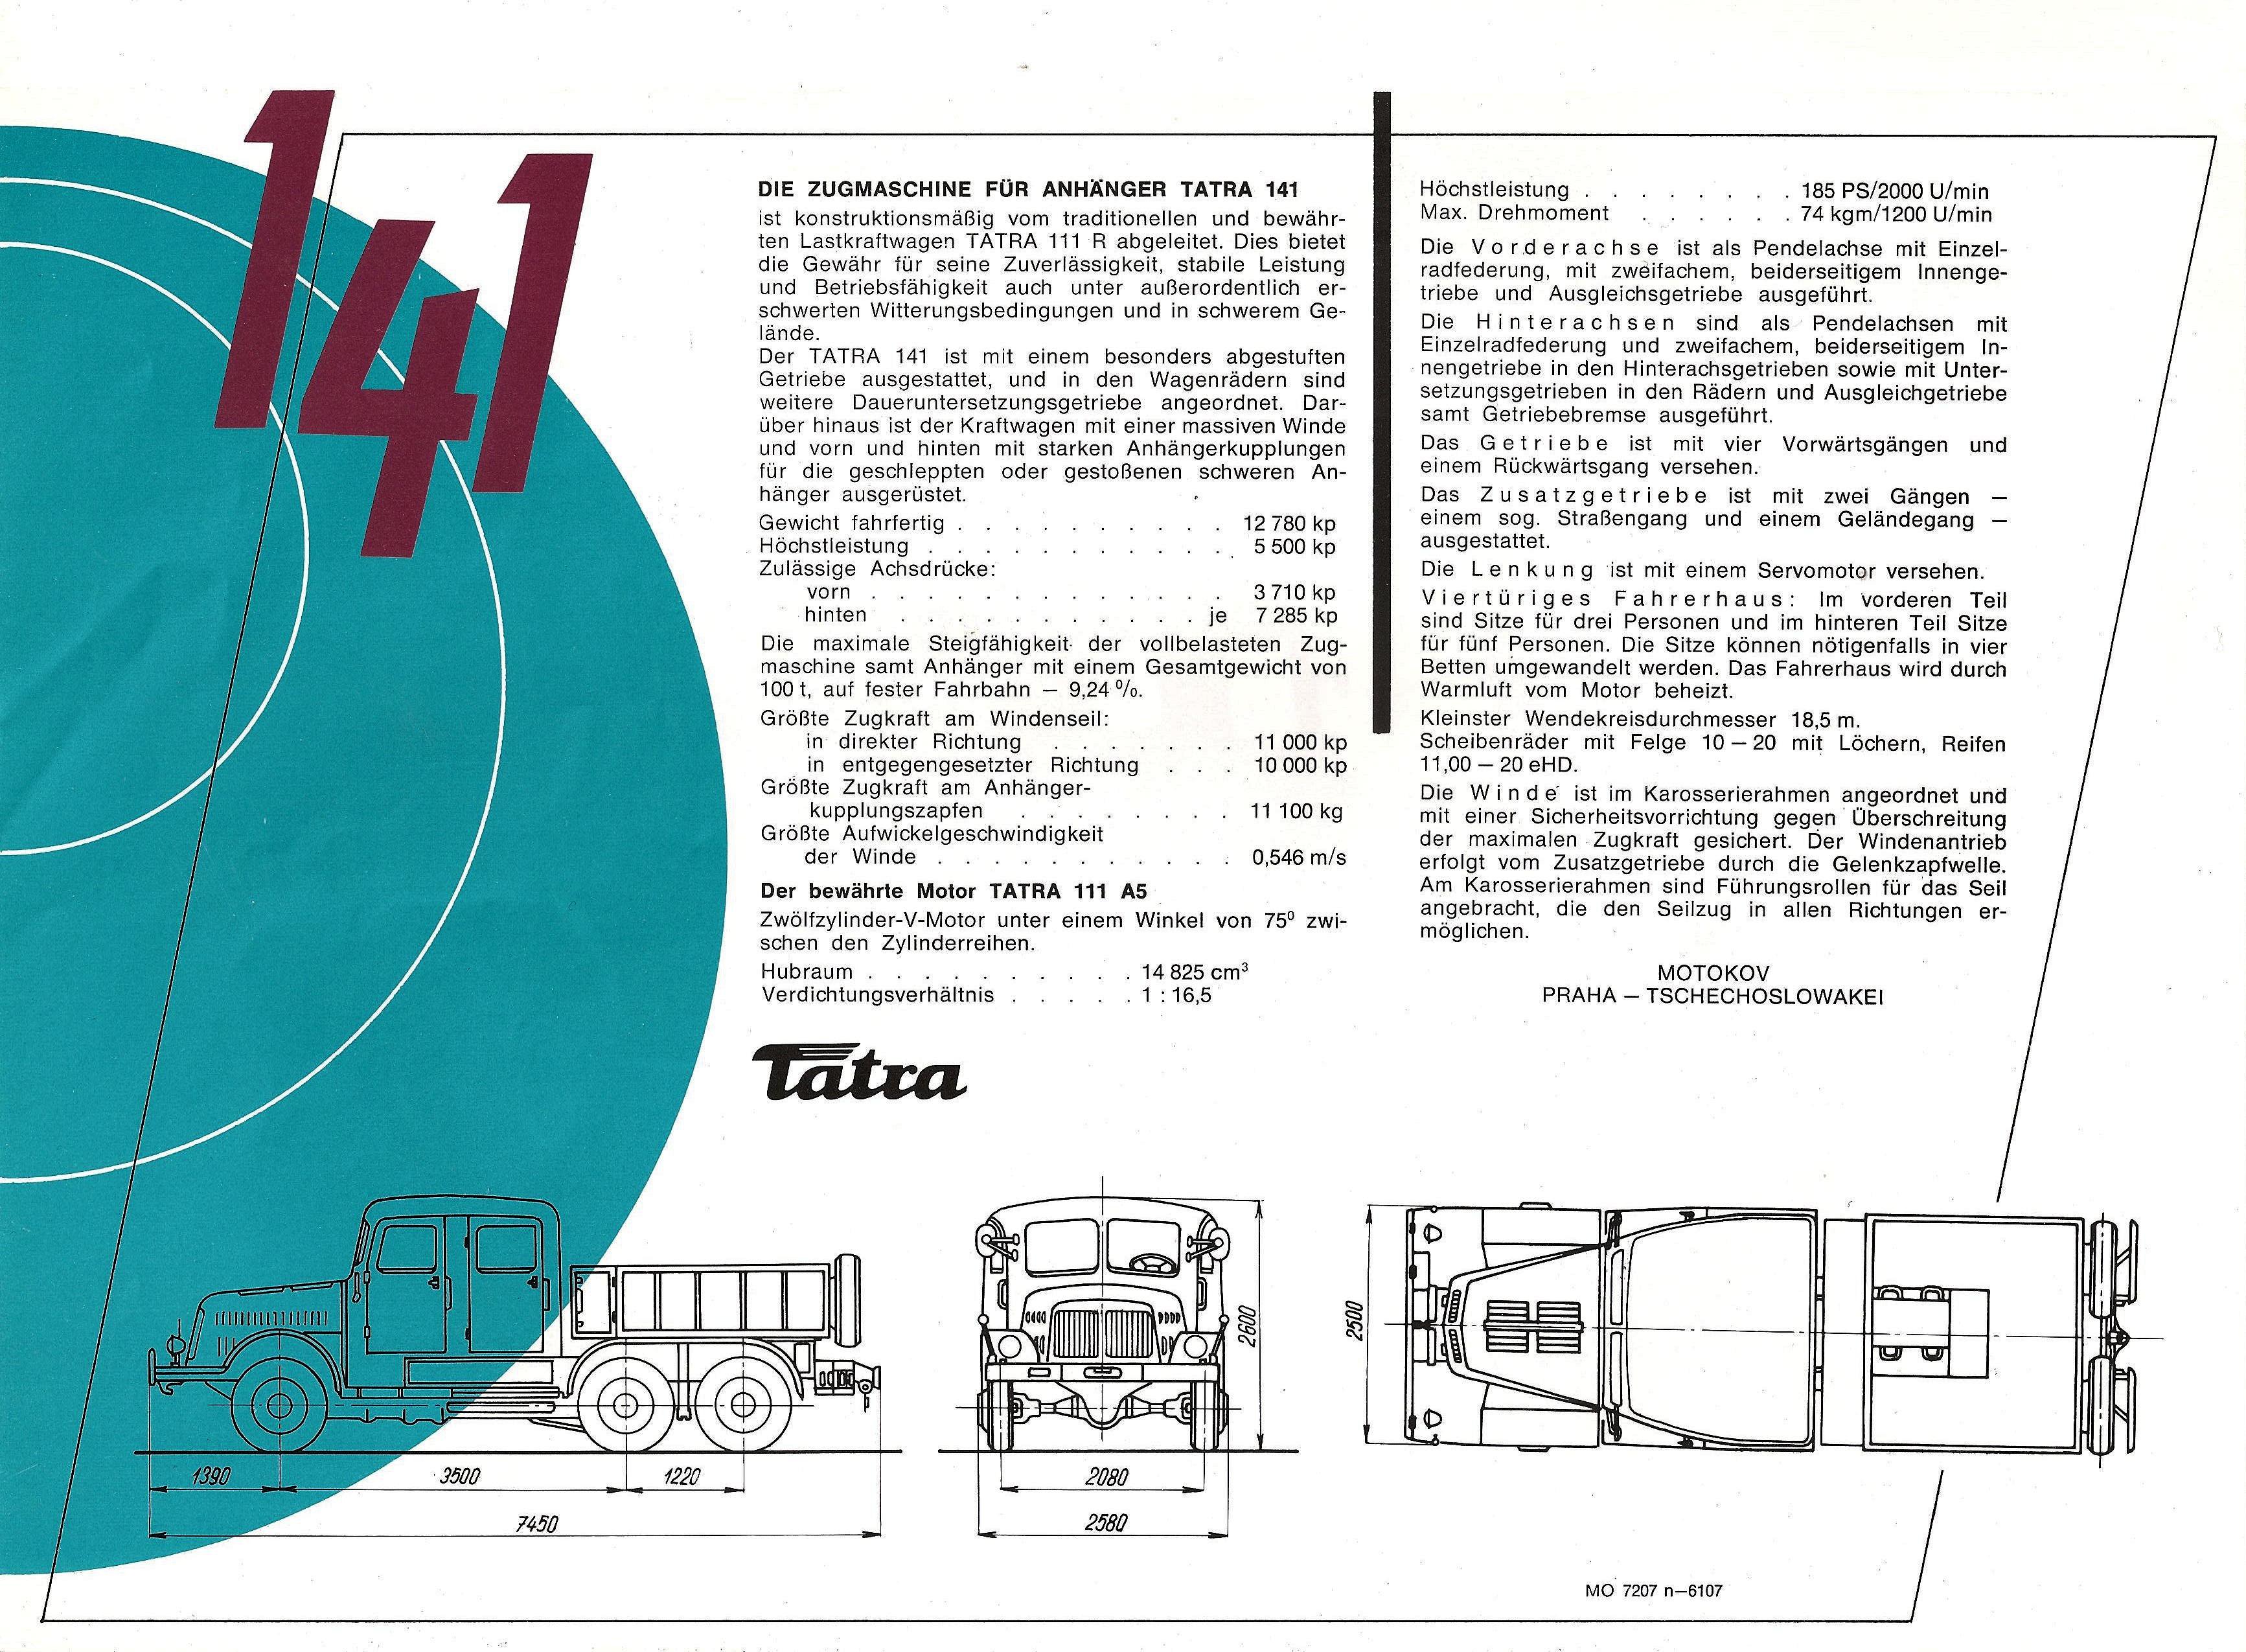 Truck And Car >> 1957-70 Tatra 141 brochure